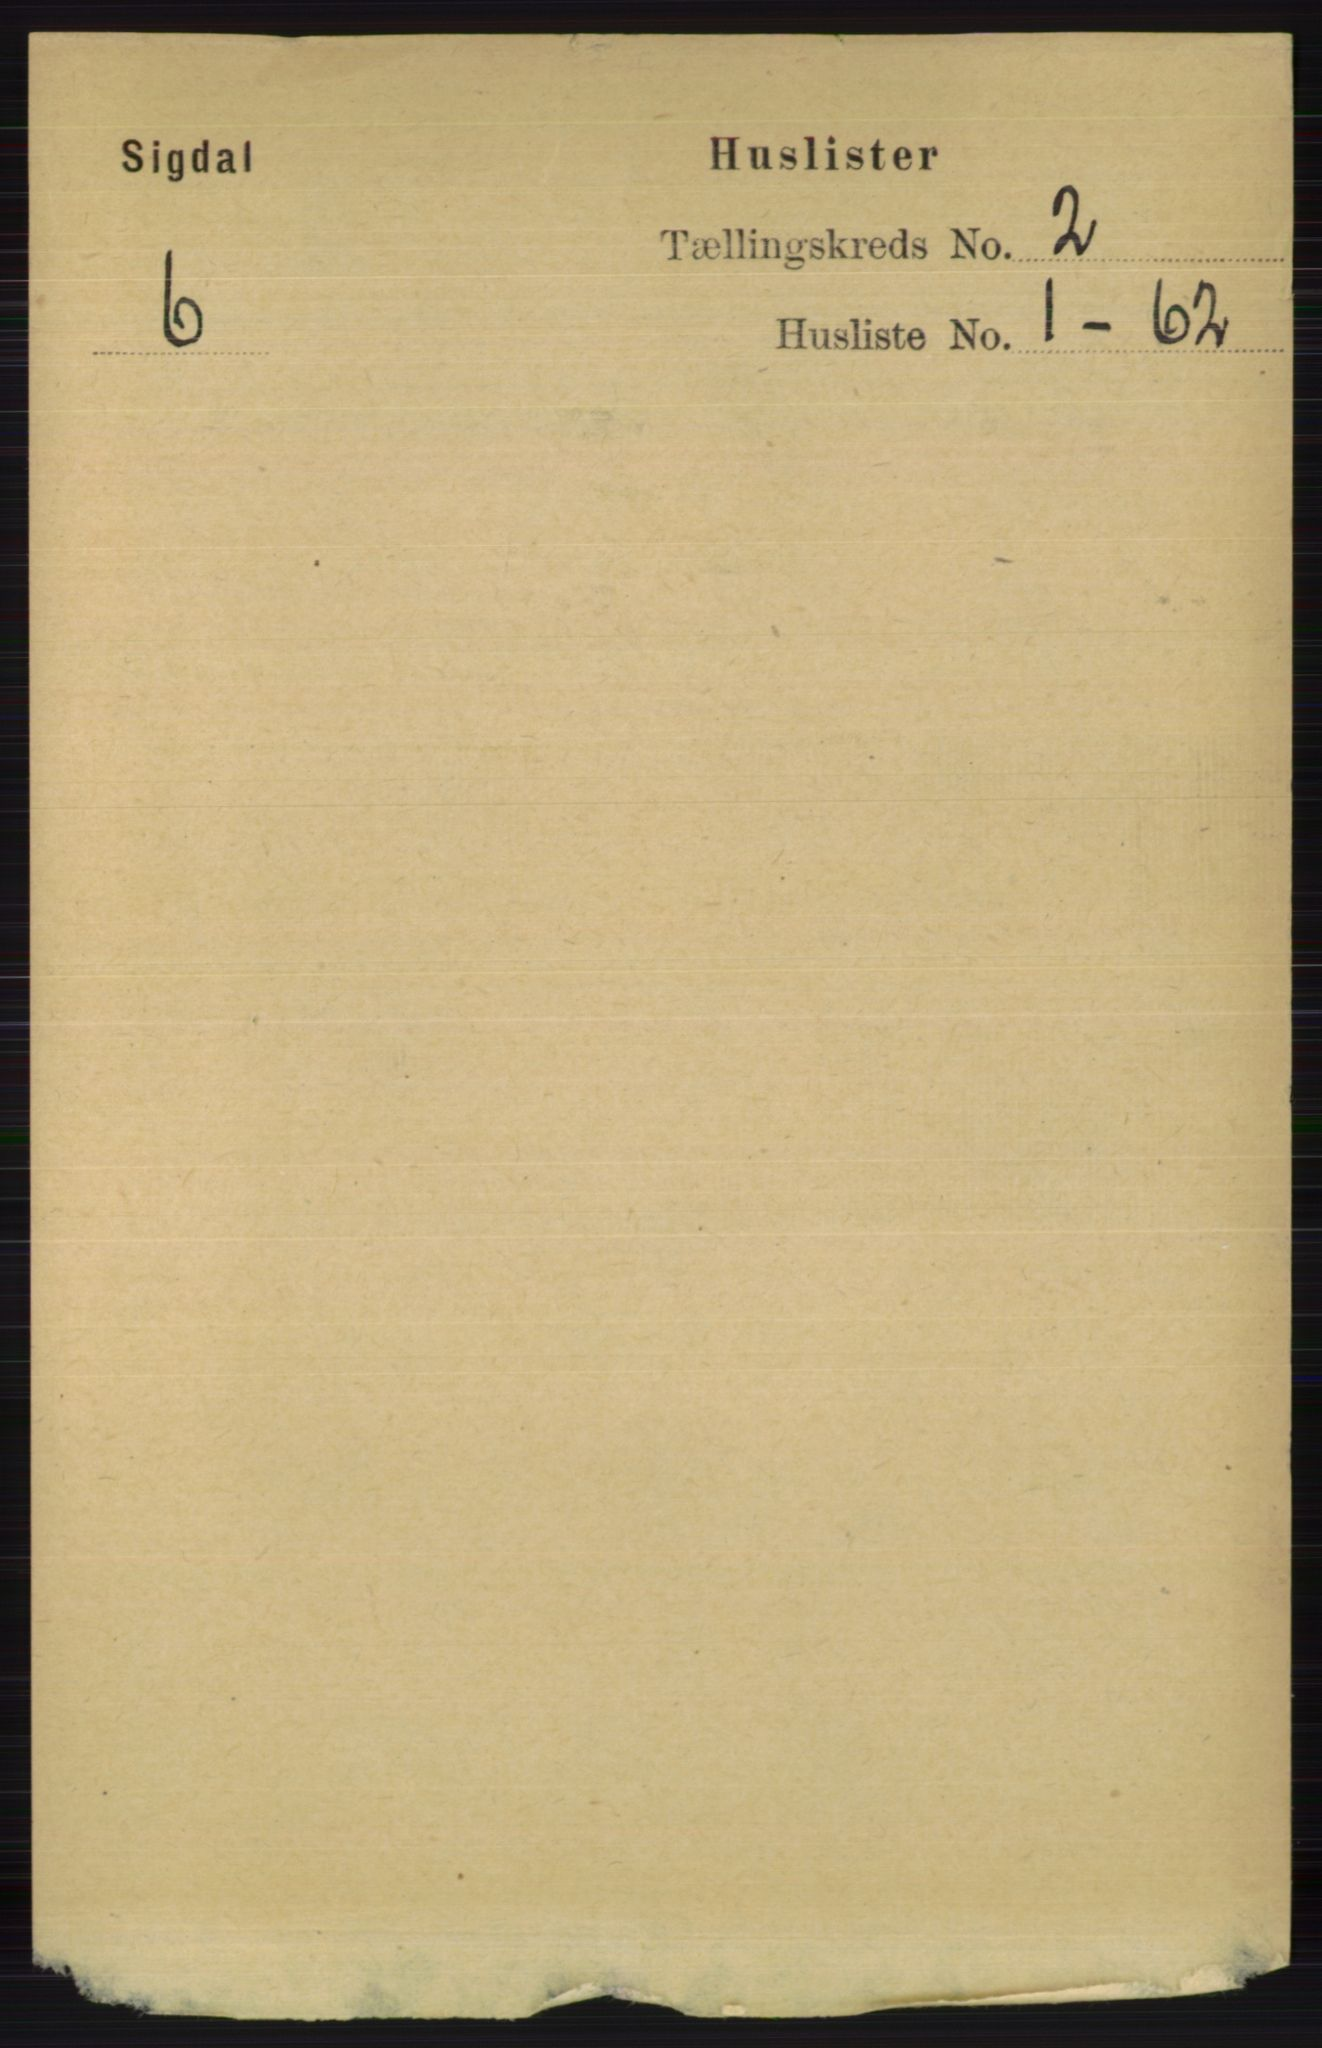 RA, Folketelling 1891 for 0621 Sigdal herred, 1891, s. 889